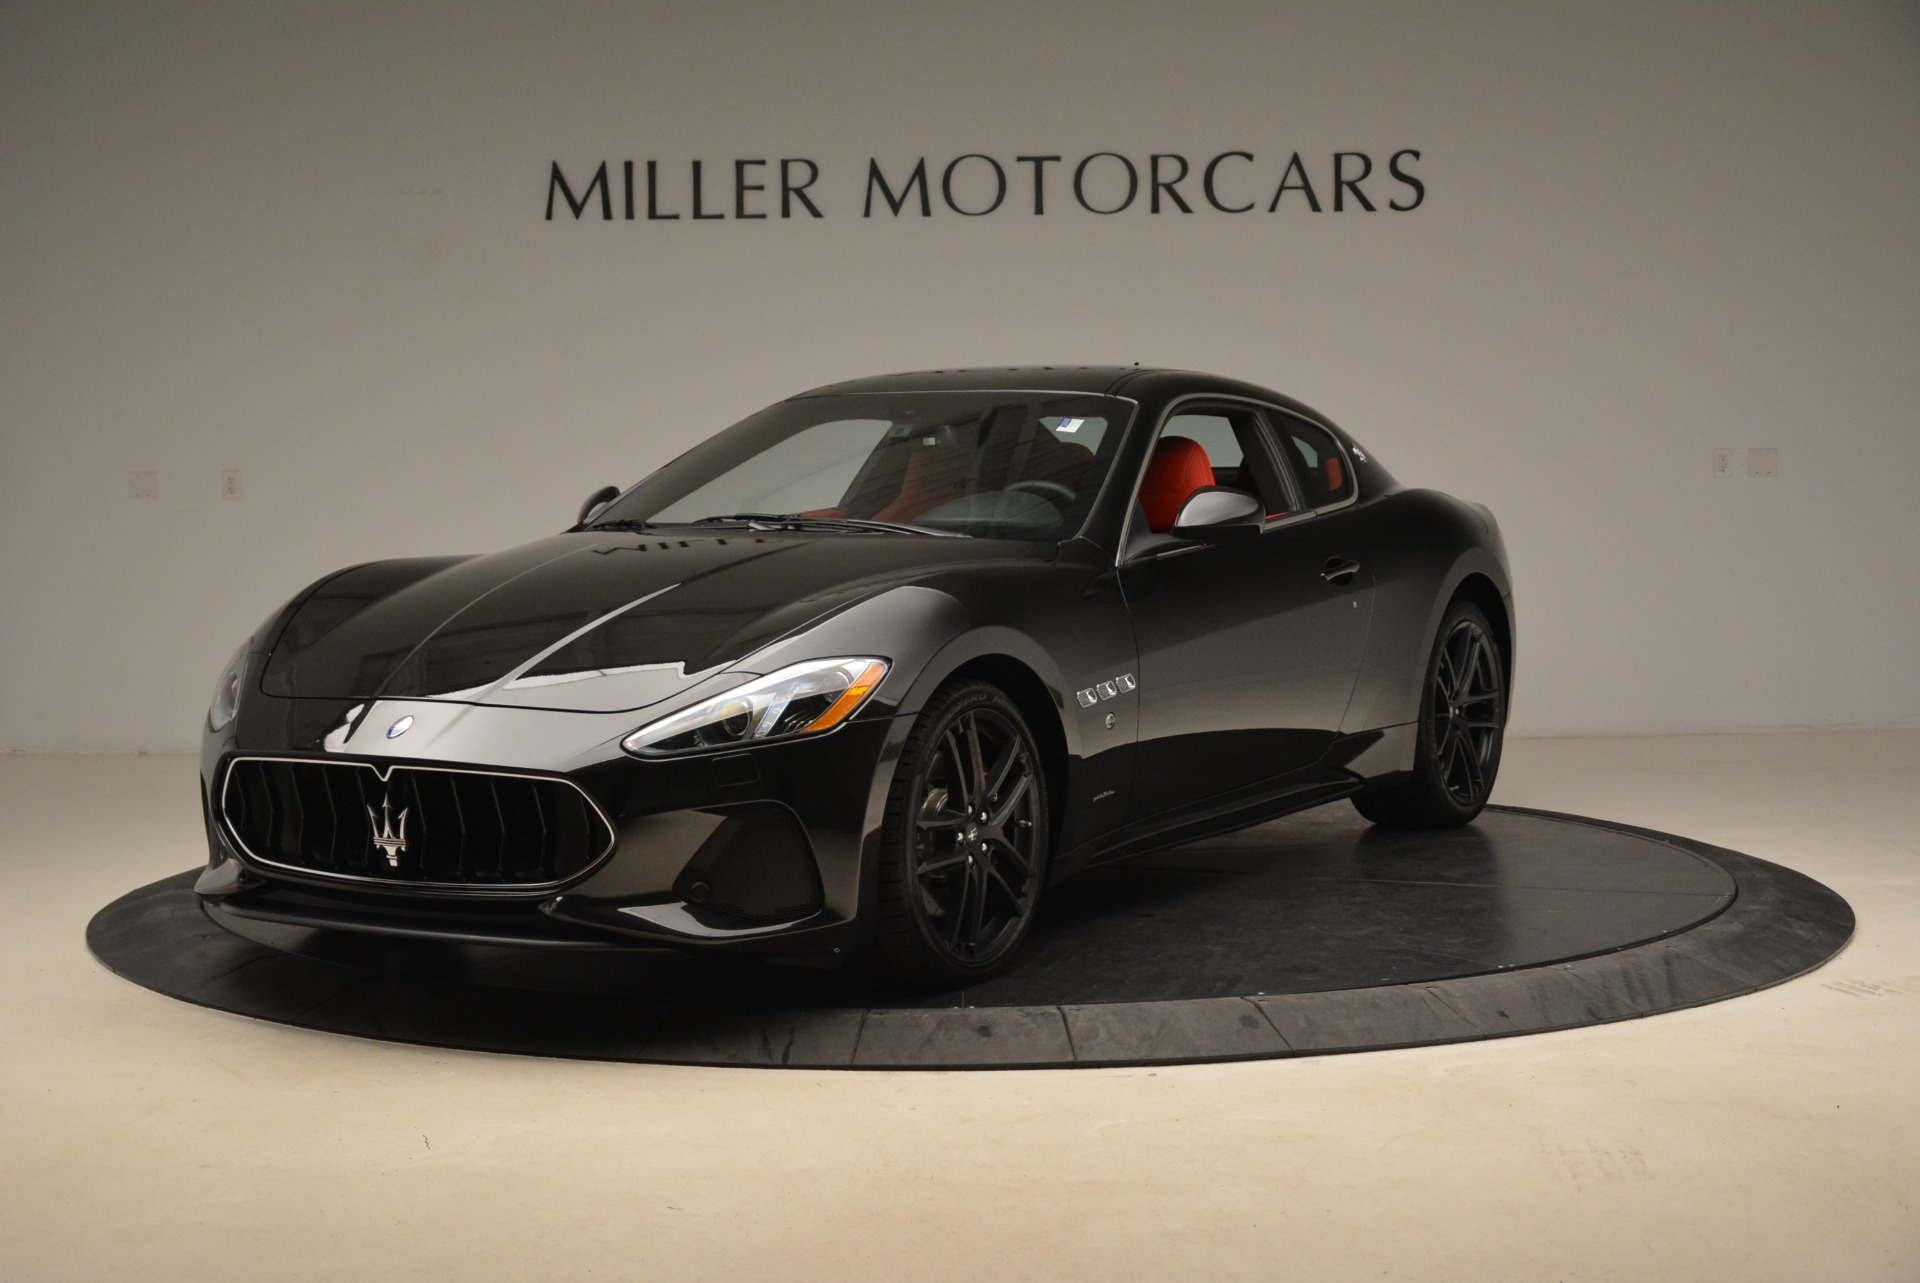 New 2018 Maserati GranTurismo Sport For Sale In Westport, CT 3059_main